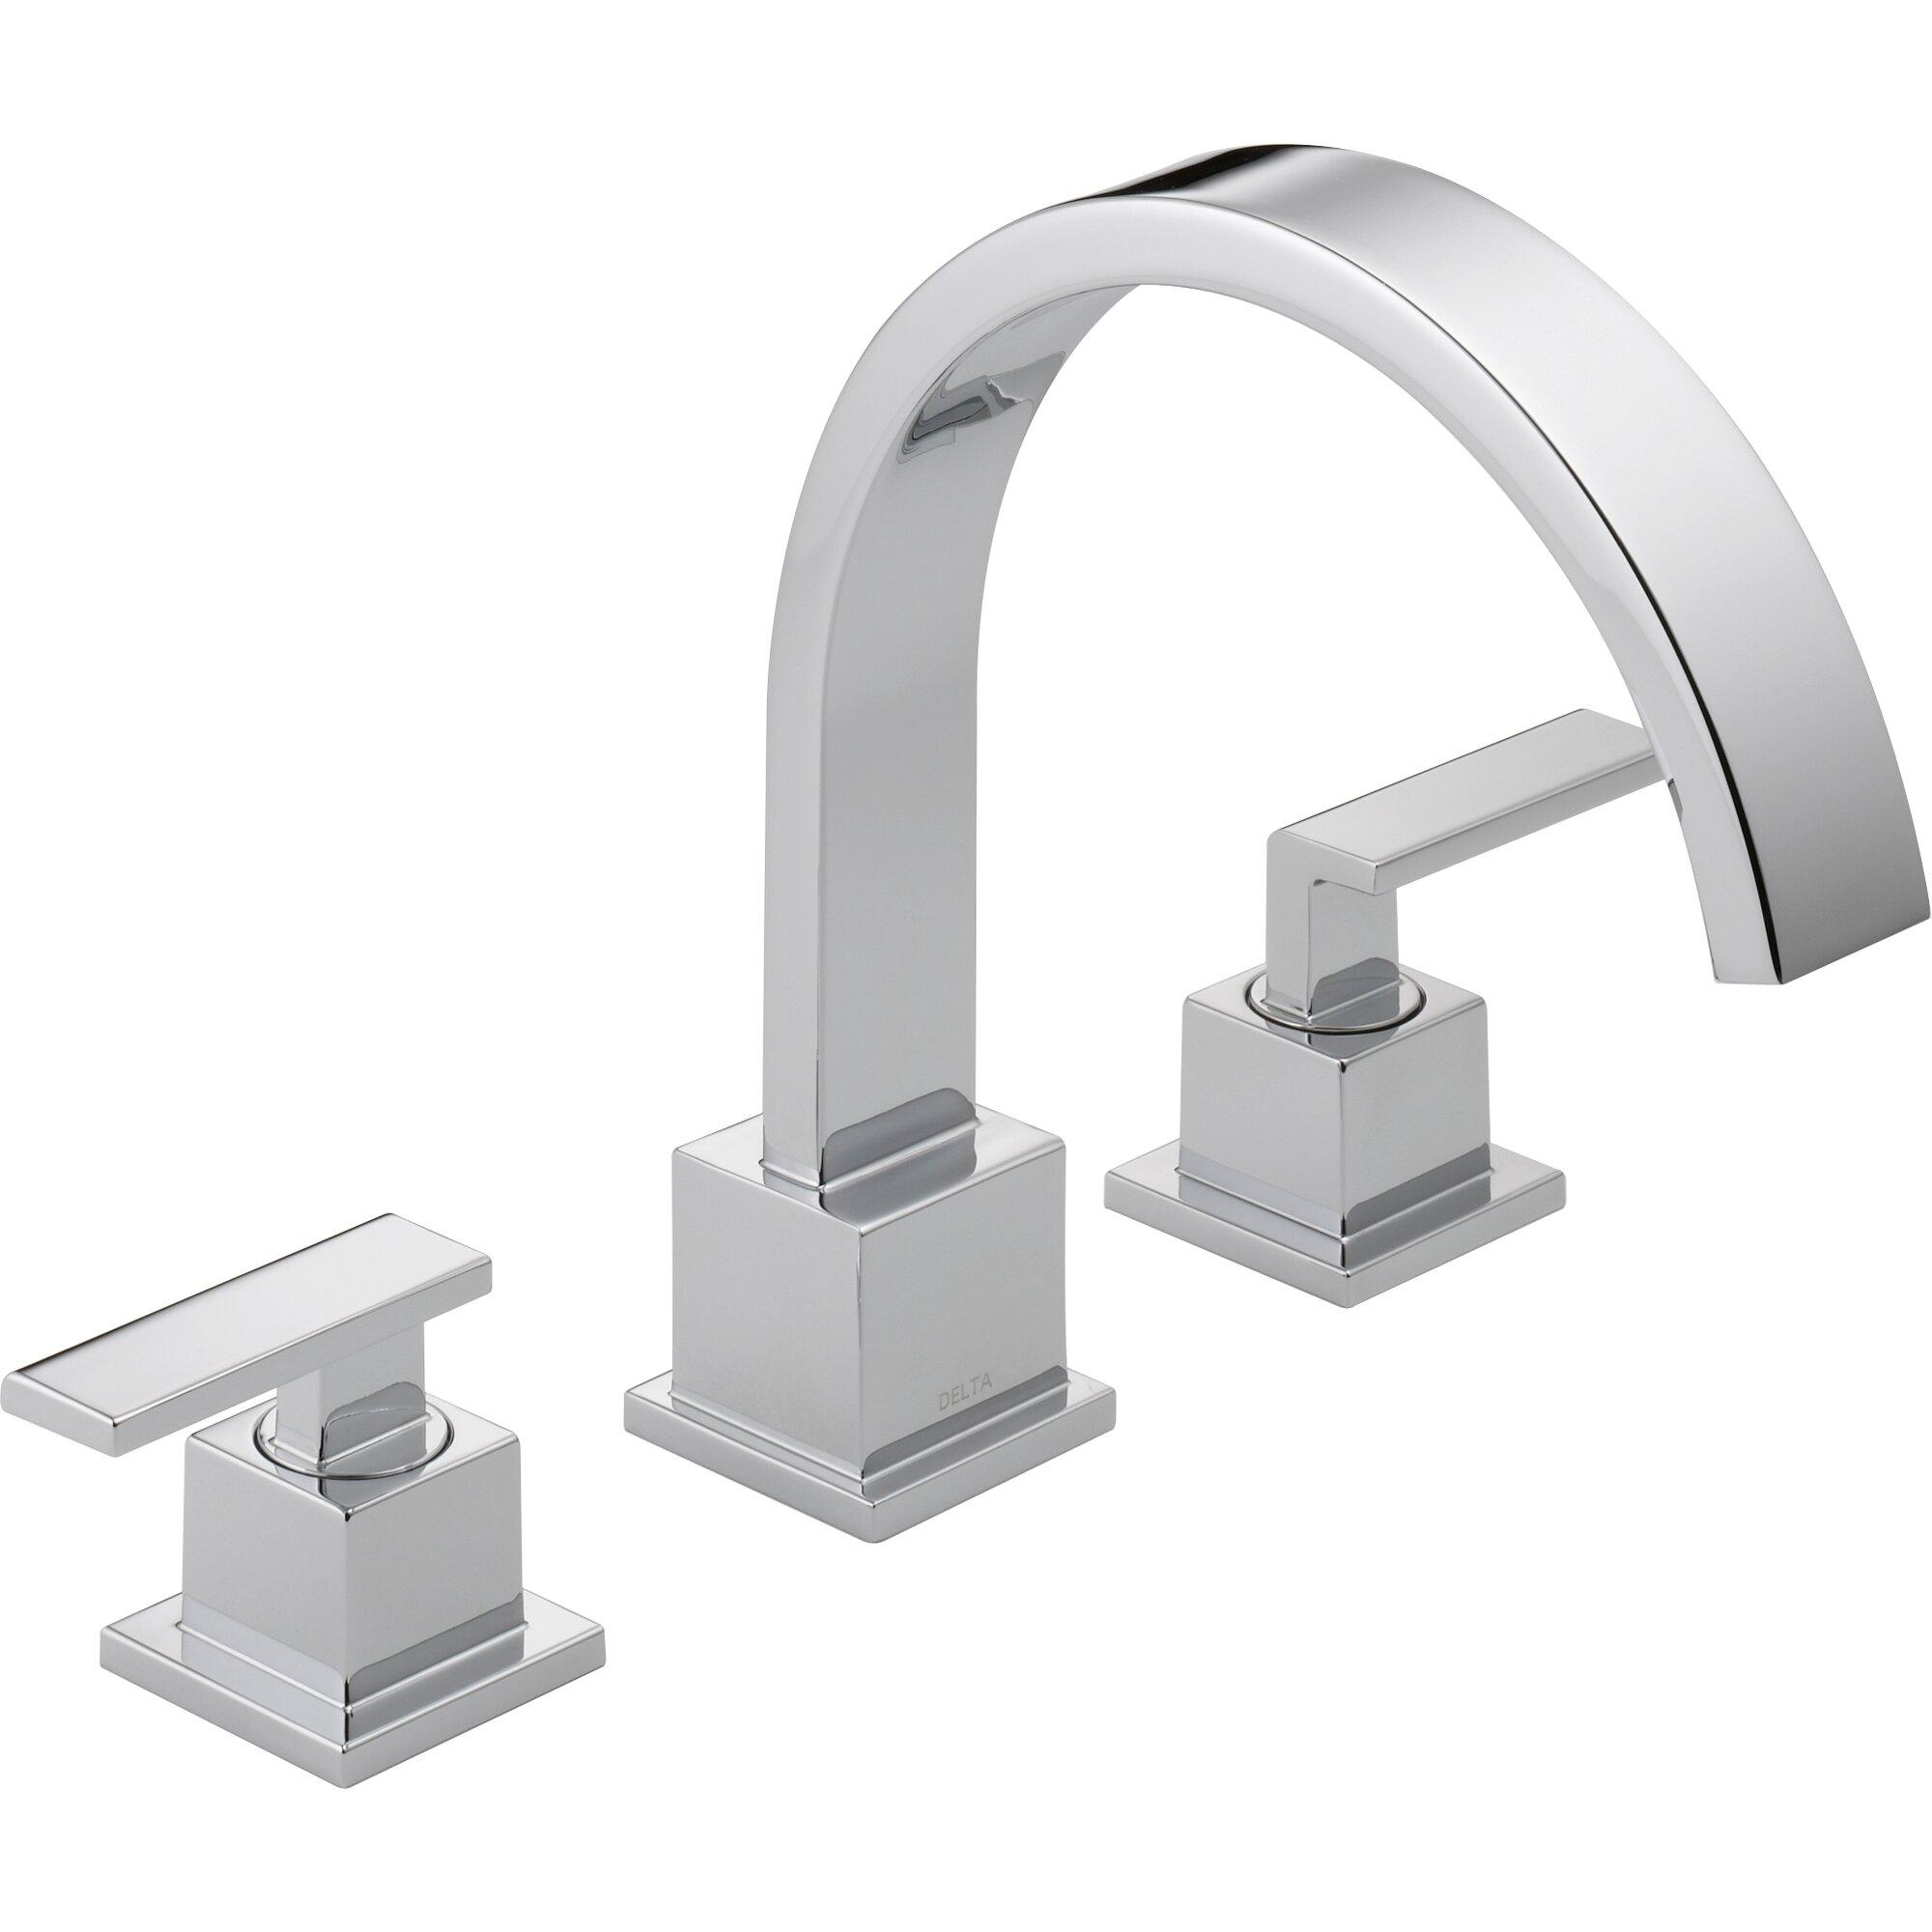 Delta Vero Double Handle Deck Mount Roman Tub Faucet Trim - Wall mount roman tub filler